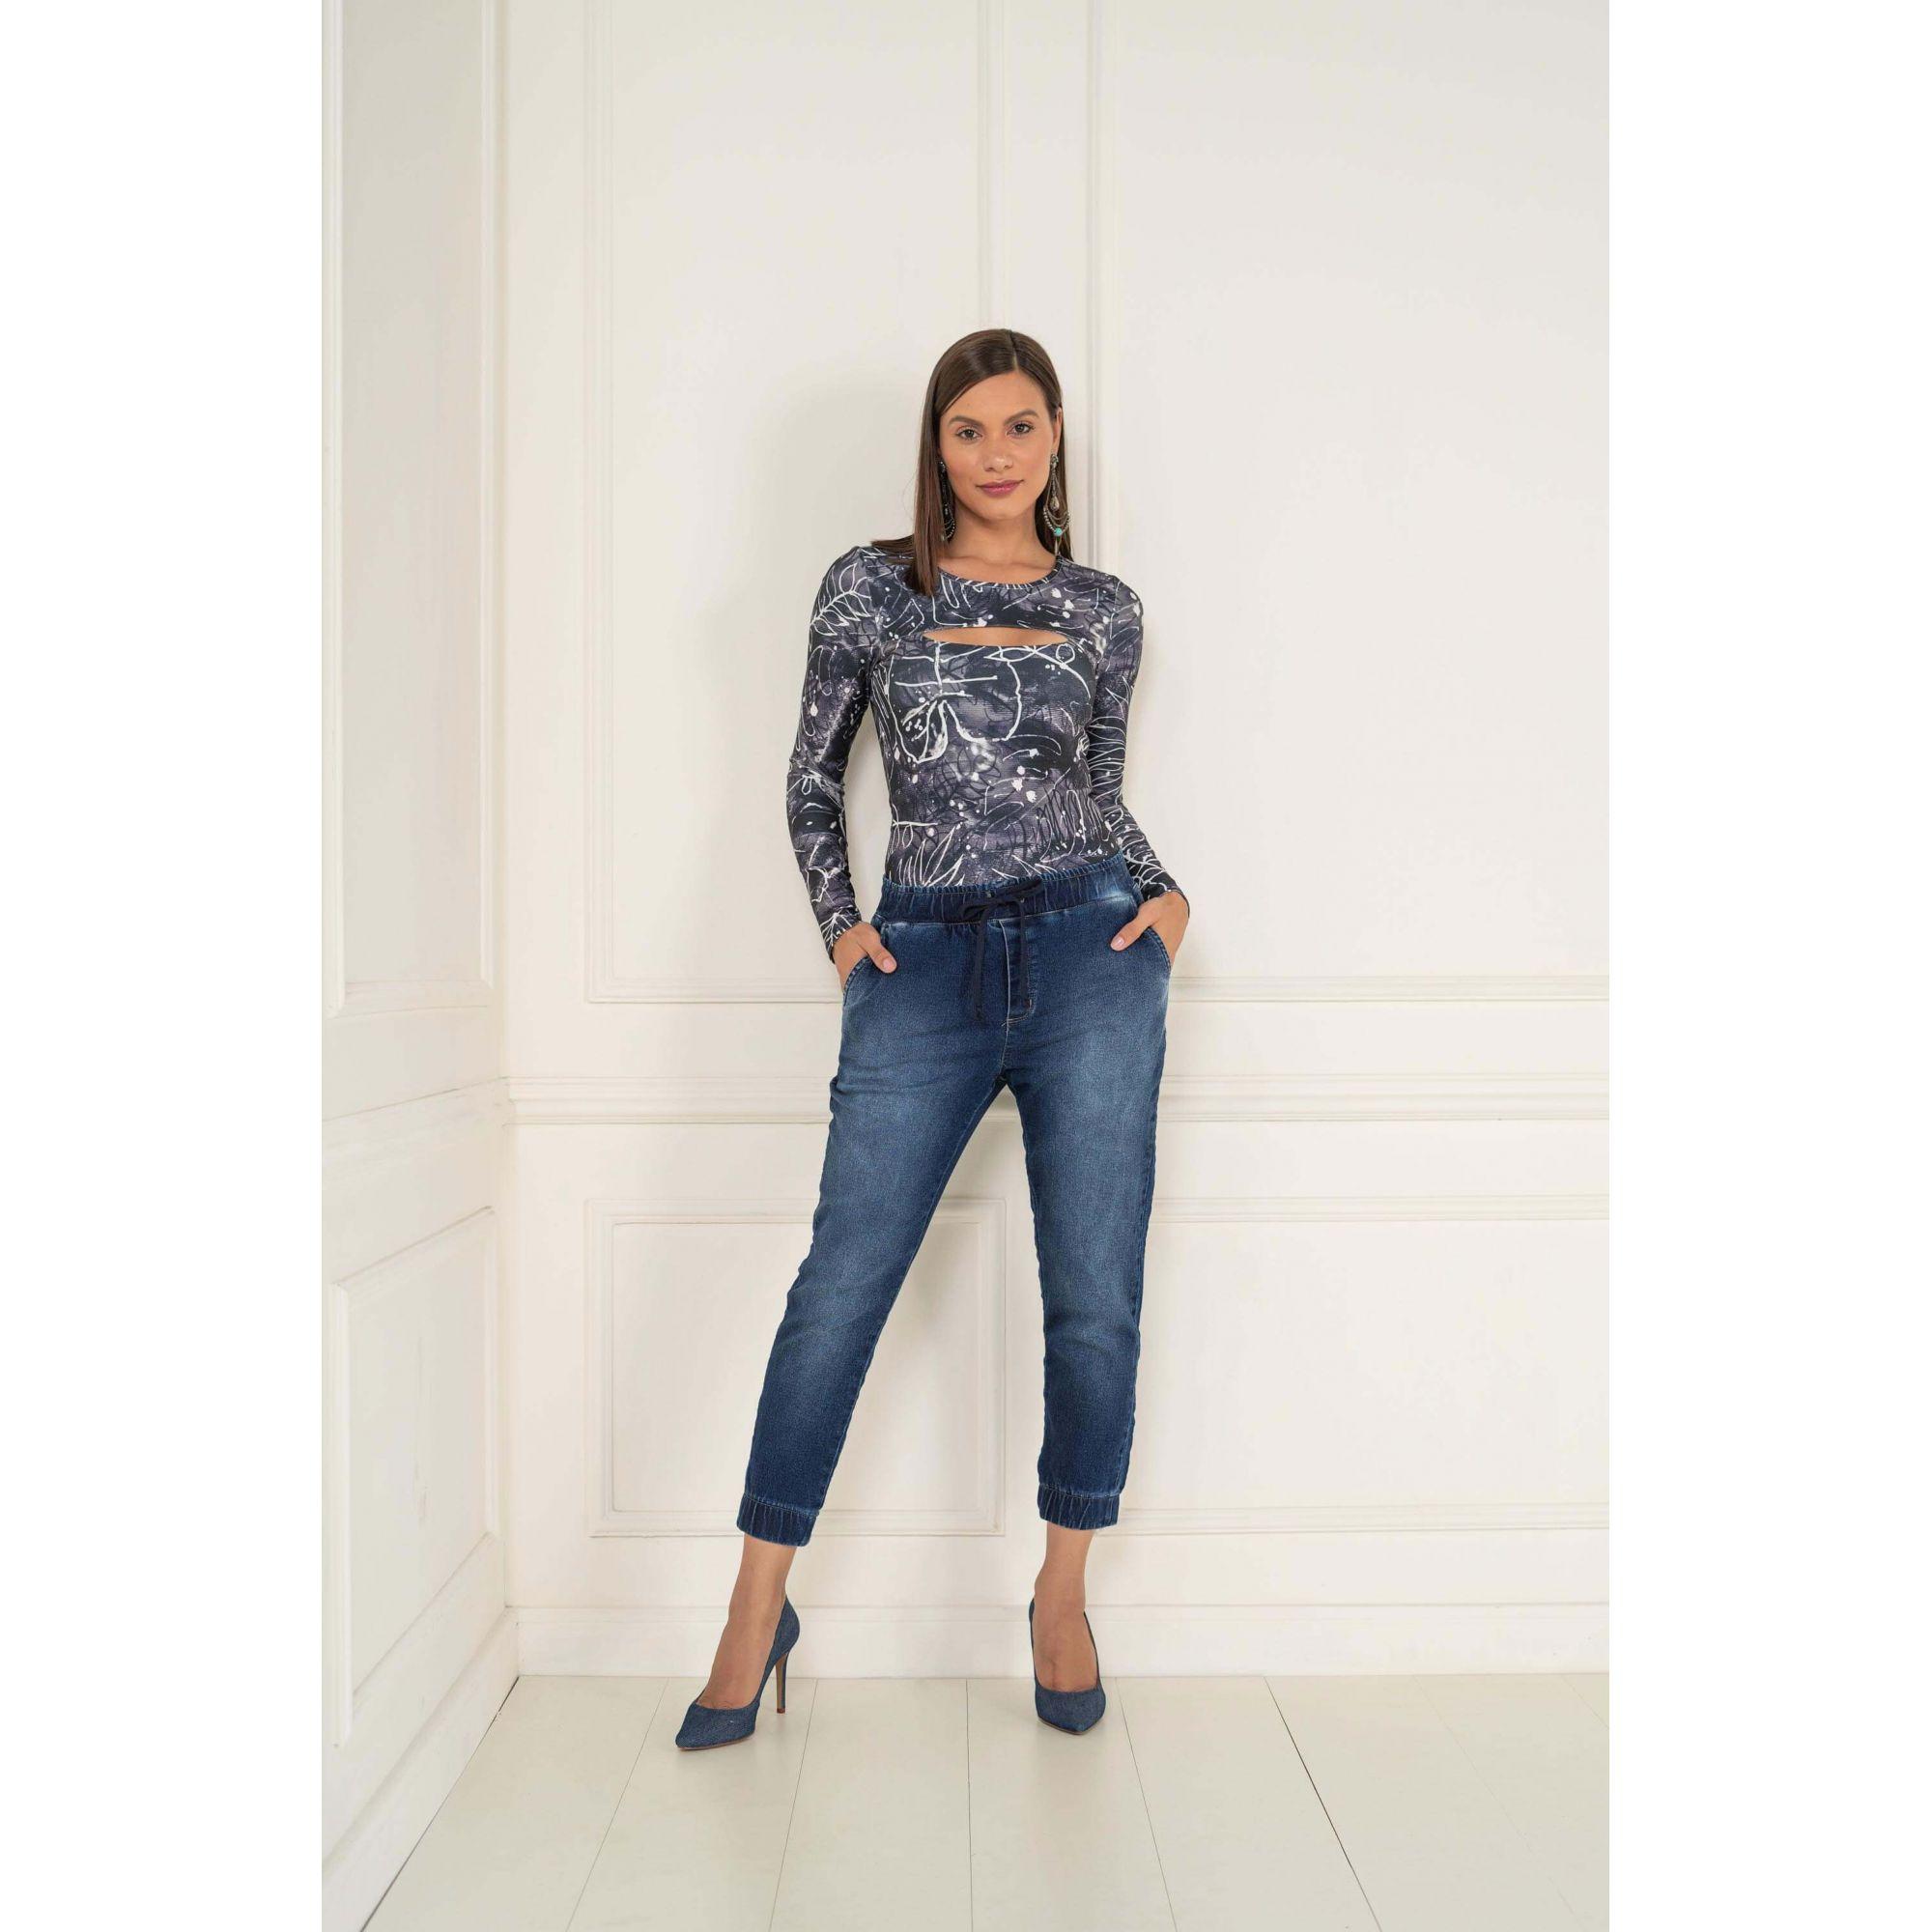 Calça Feminino Jogger Lycra Jeans - KACOLAKO